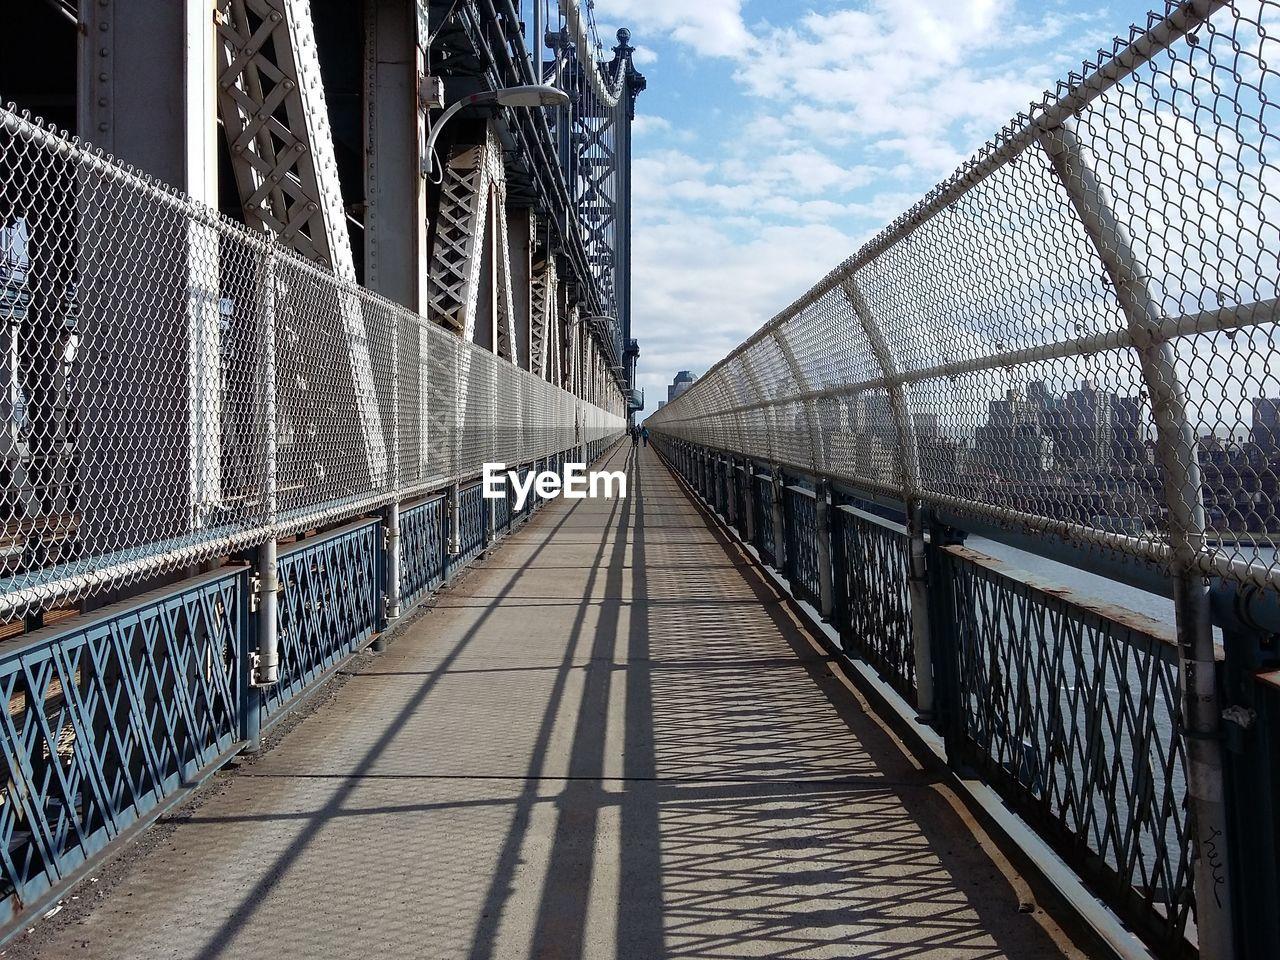 the way forward, cloud - sky, bridge - man made structure, railing, connection, architecture, built structure, sky, footbridge, day, outdoors, suspension bridge, no people, city